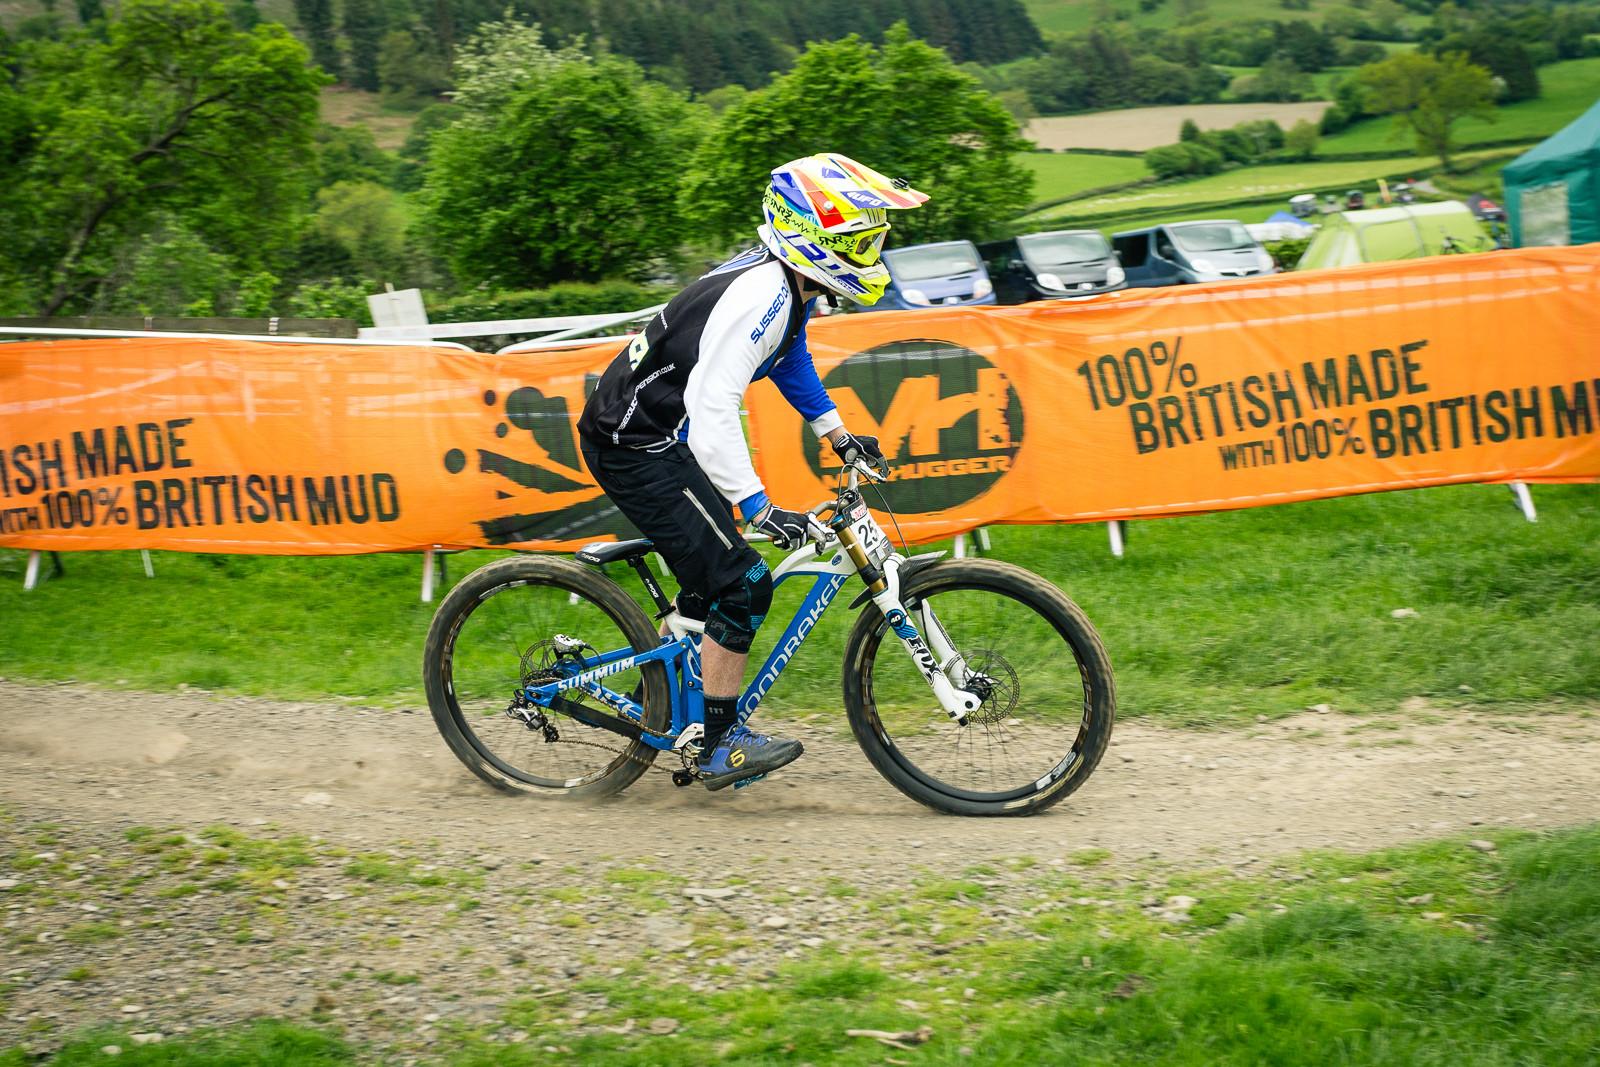 Mondraker Summum G-ed Out at Llangollen - G-Out Project - Llangollen BDS 2015 - Mountain Biking Pictures - Vital MTB